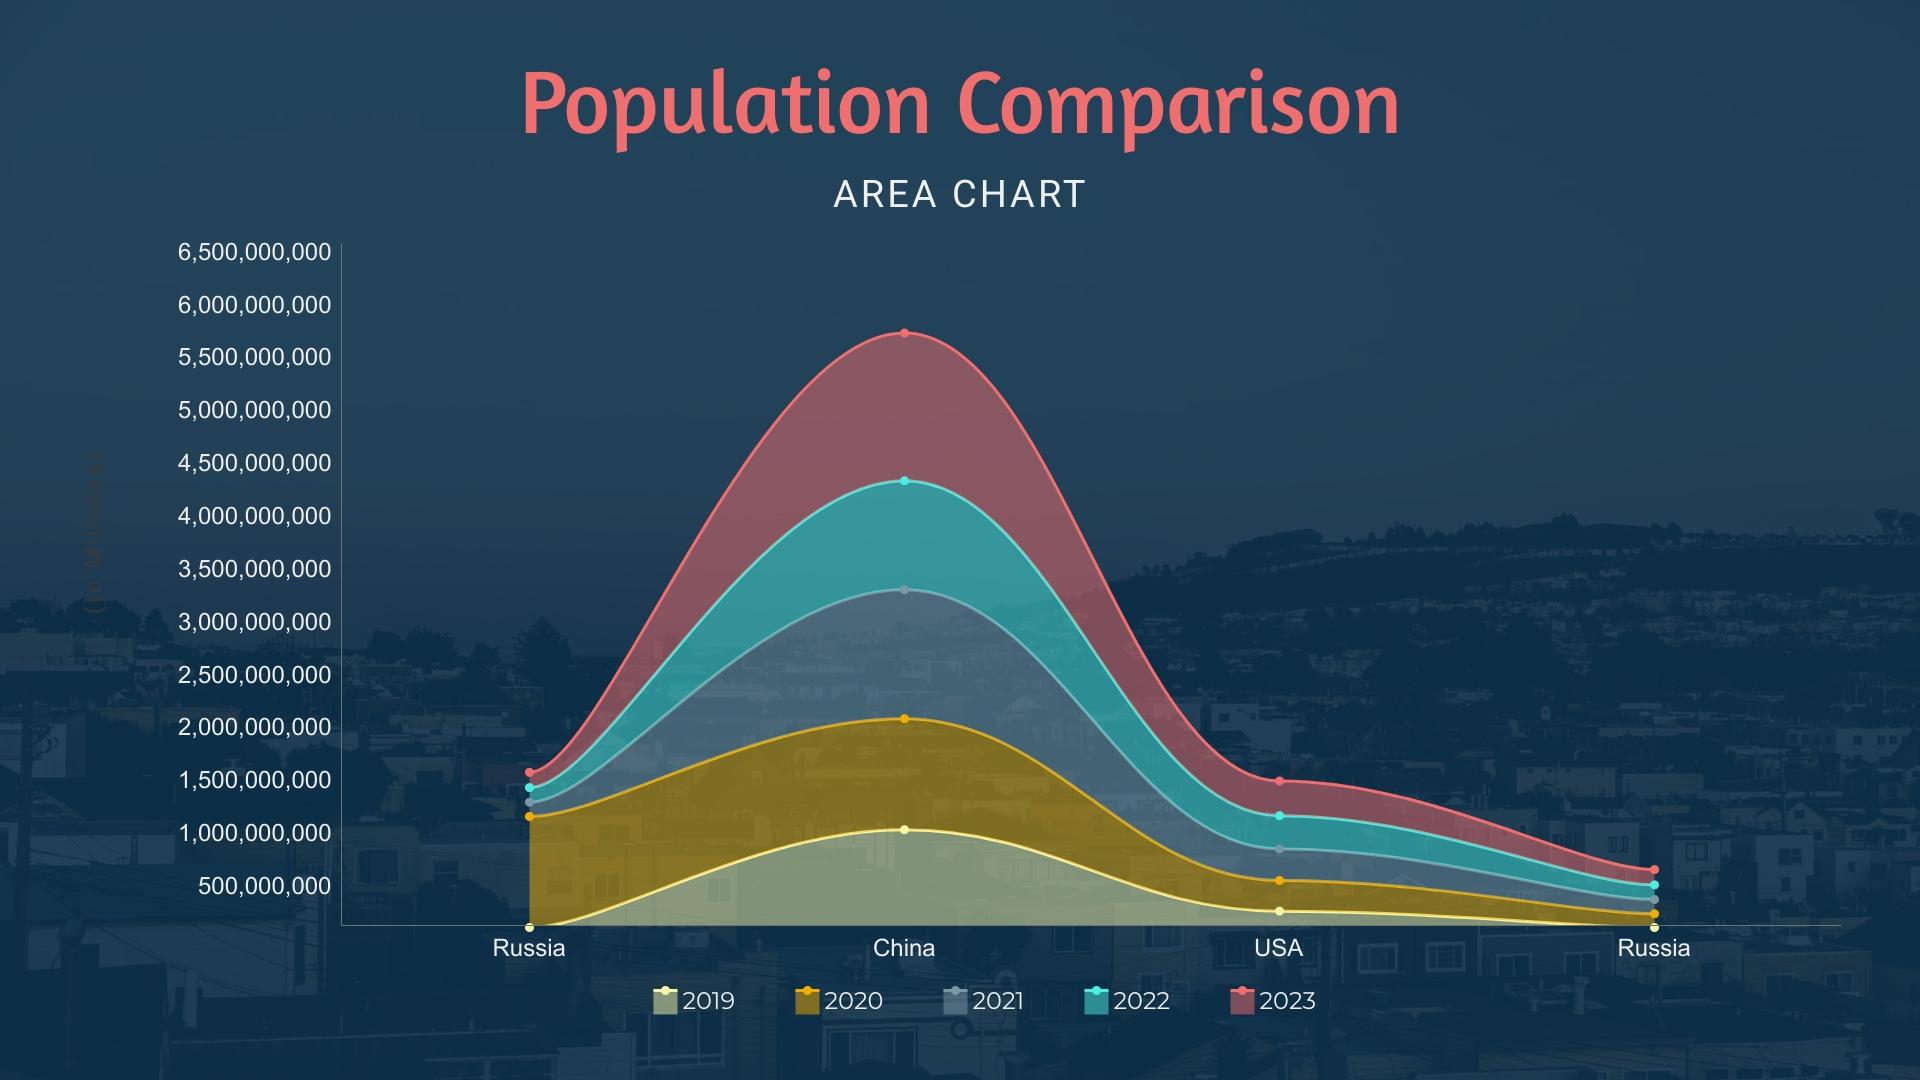 Population Comparison Area Chart Template